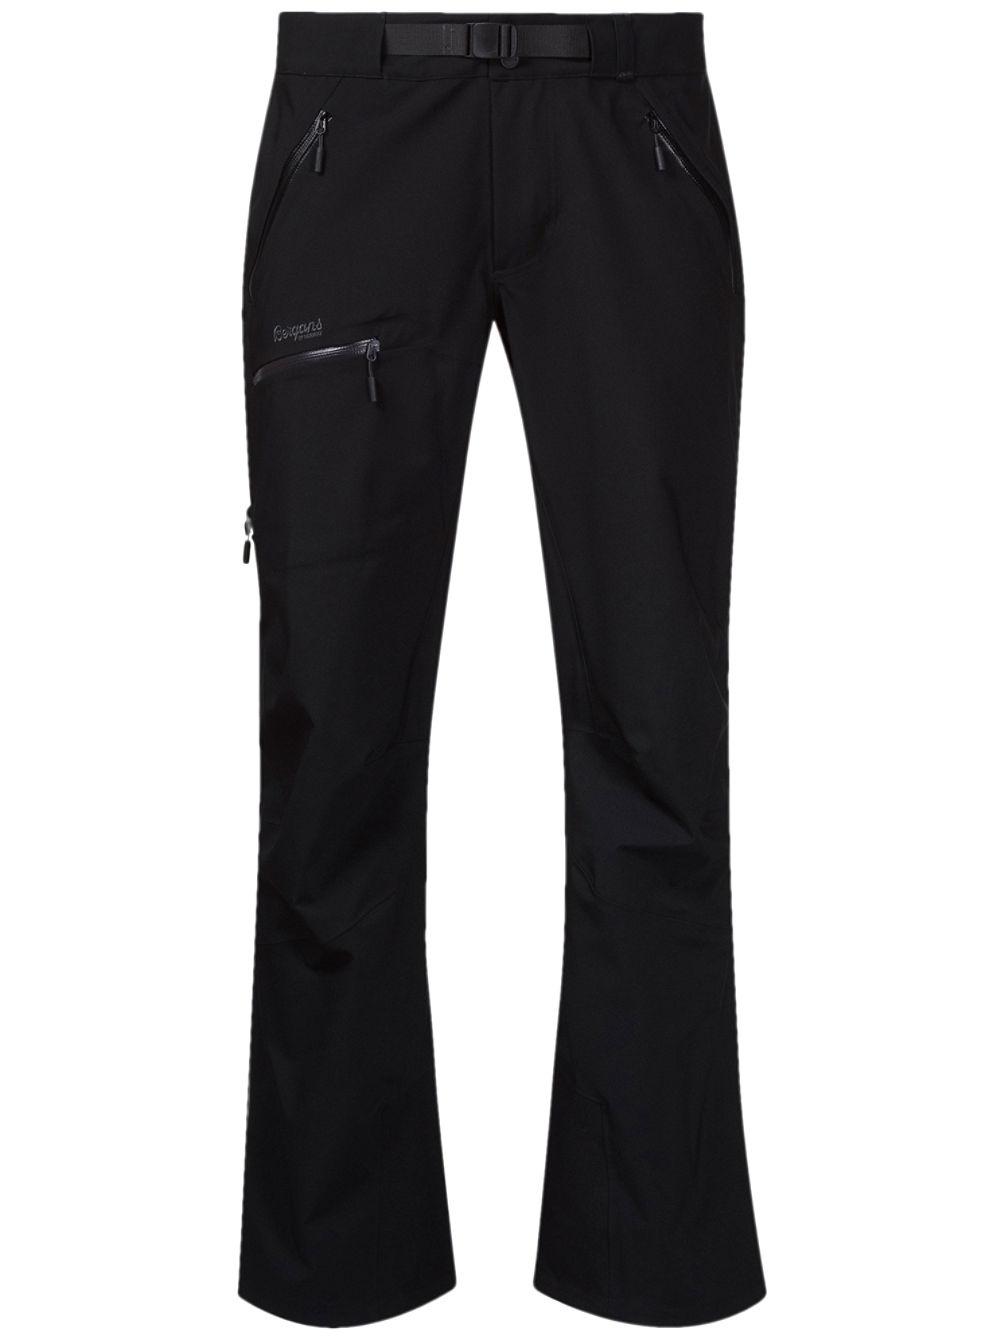 b91ddd0b Buy Bergans Breheimen 3L Outdoor Pants online at Blue Tomato